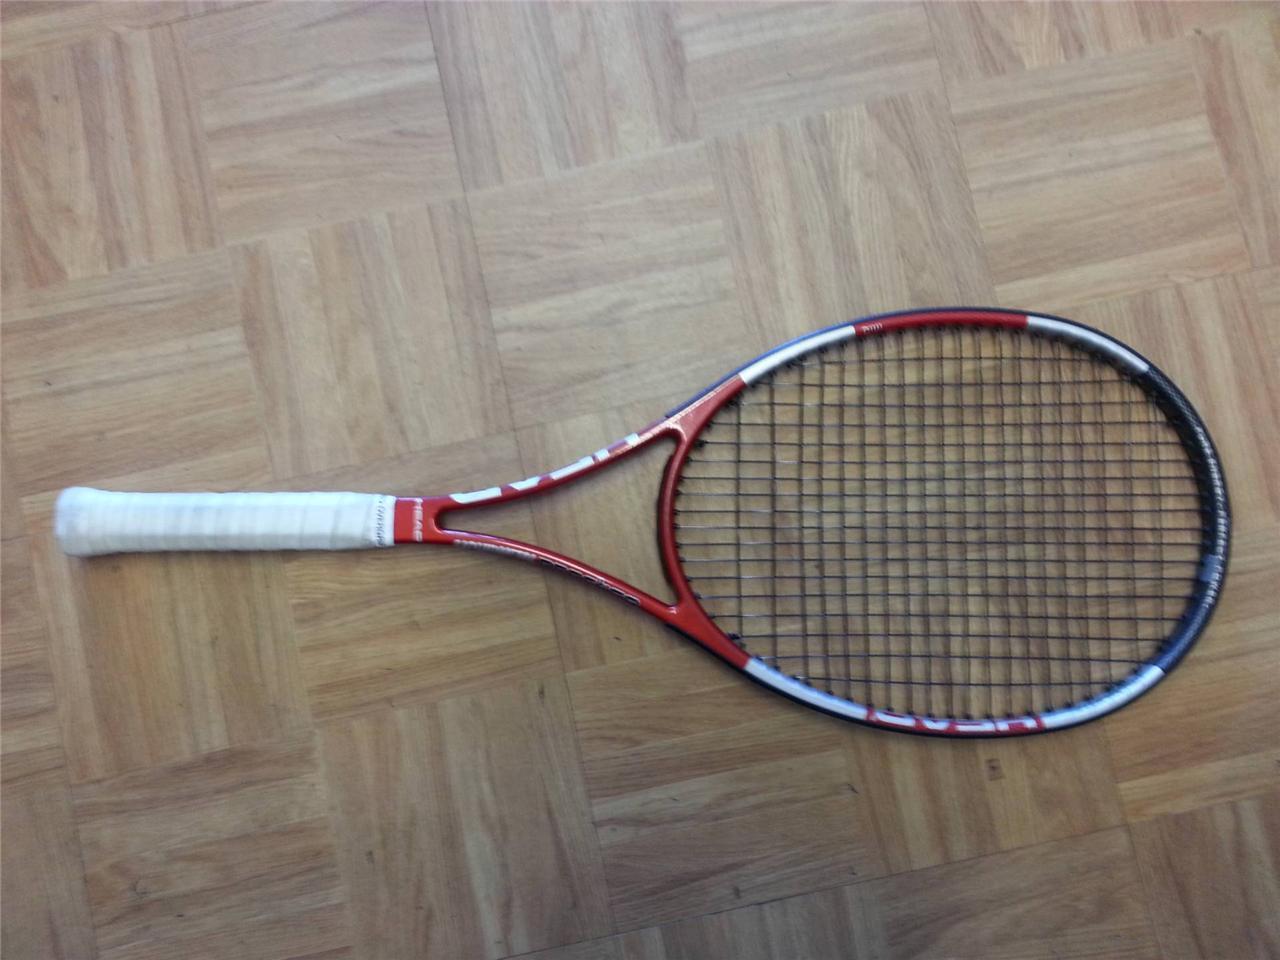 Head Liquidmetal in Prestige Midsize 93 Made in Liquidmetal Austria 4 3/8 grip Tennis Racquet 1da9c4